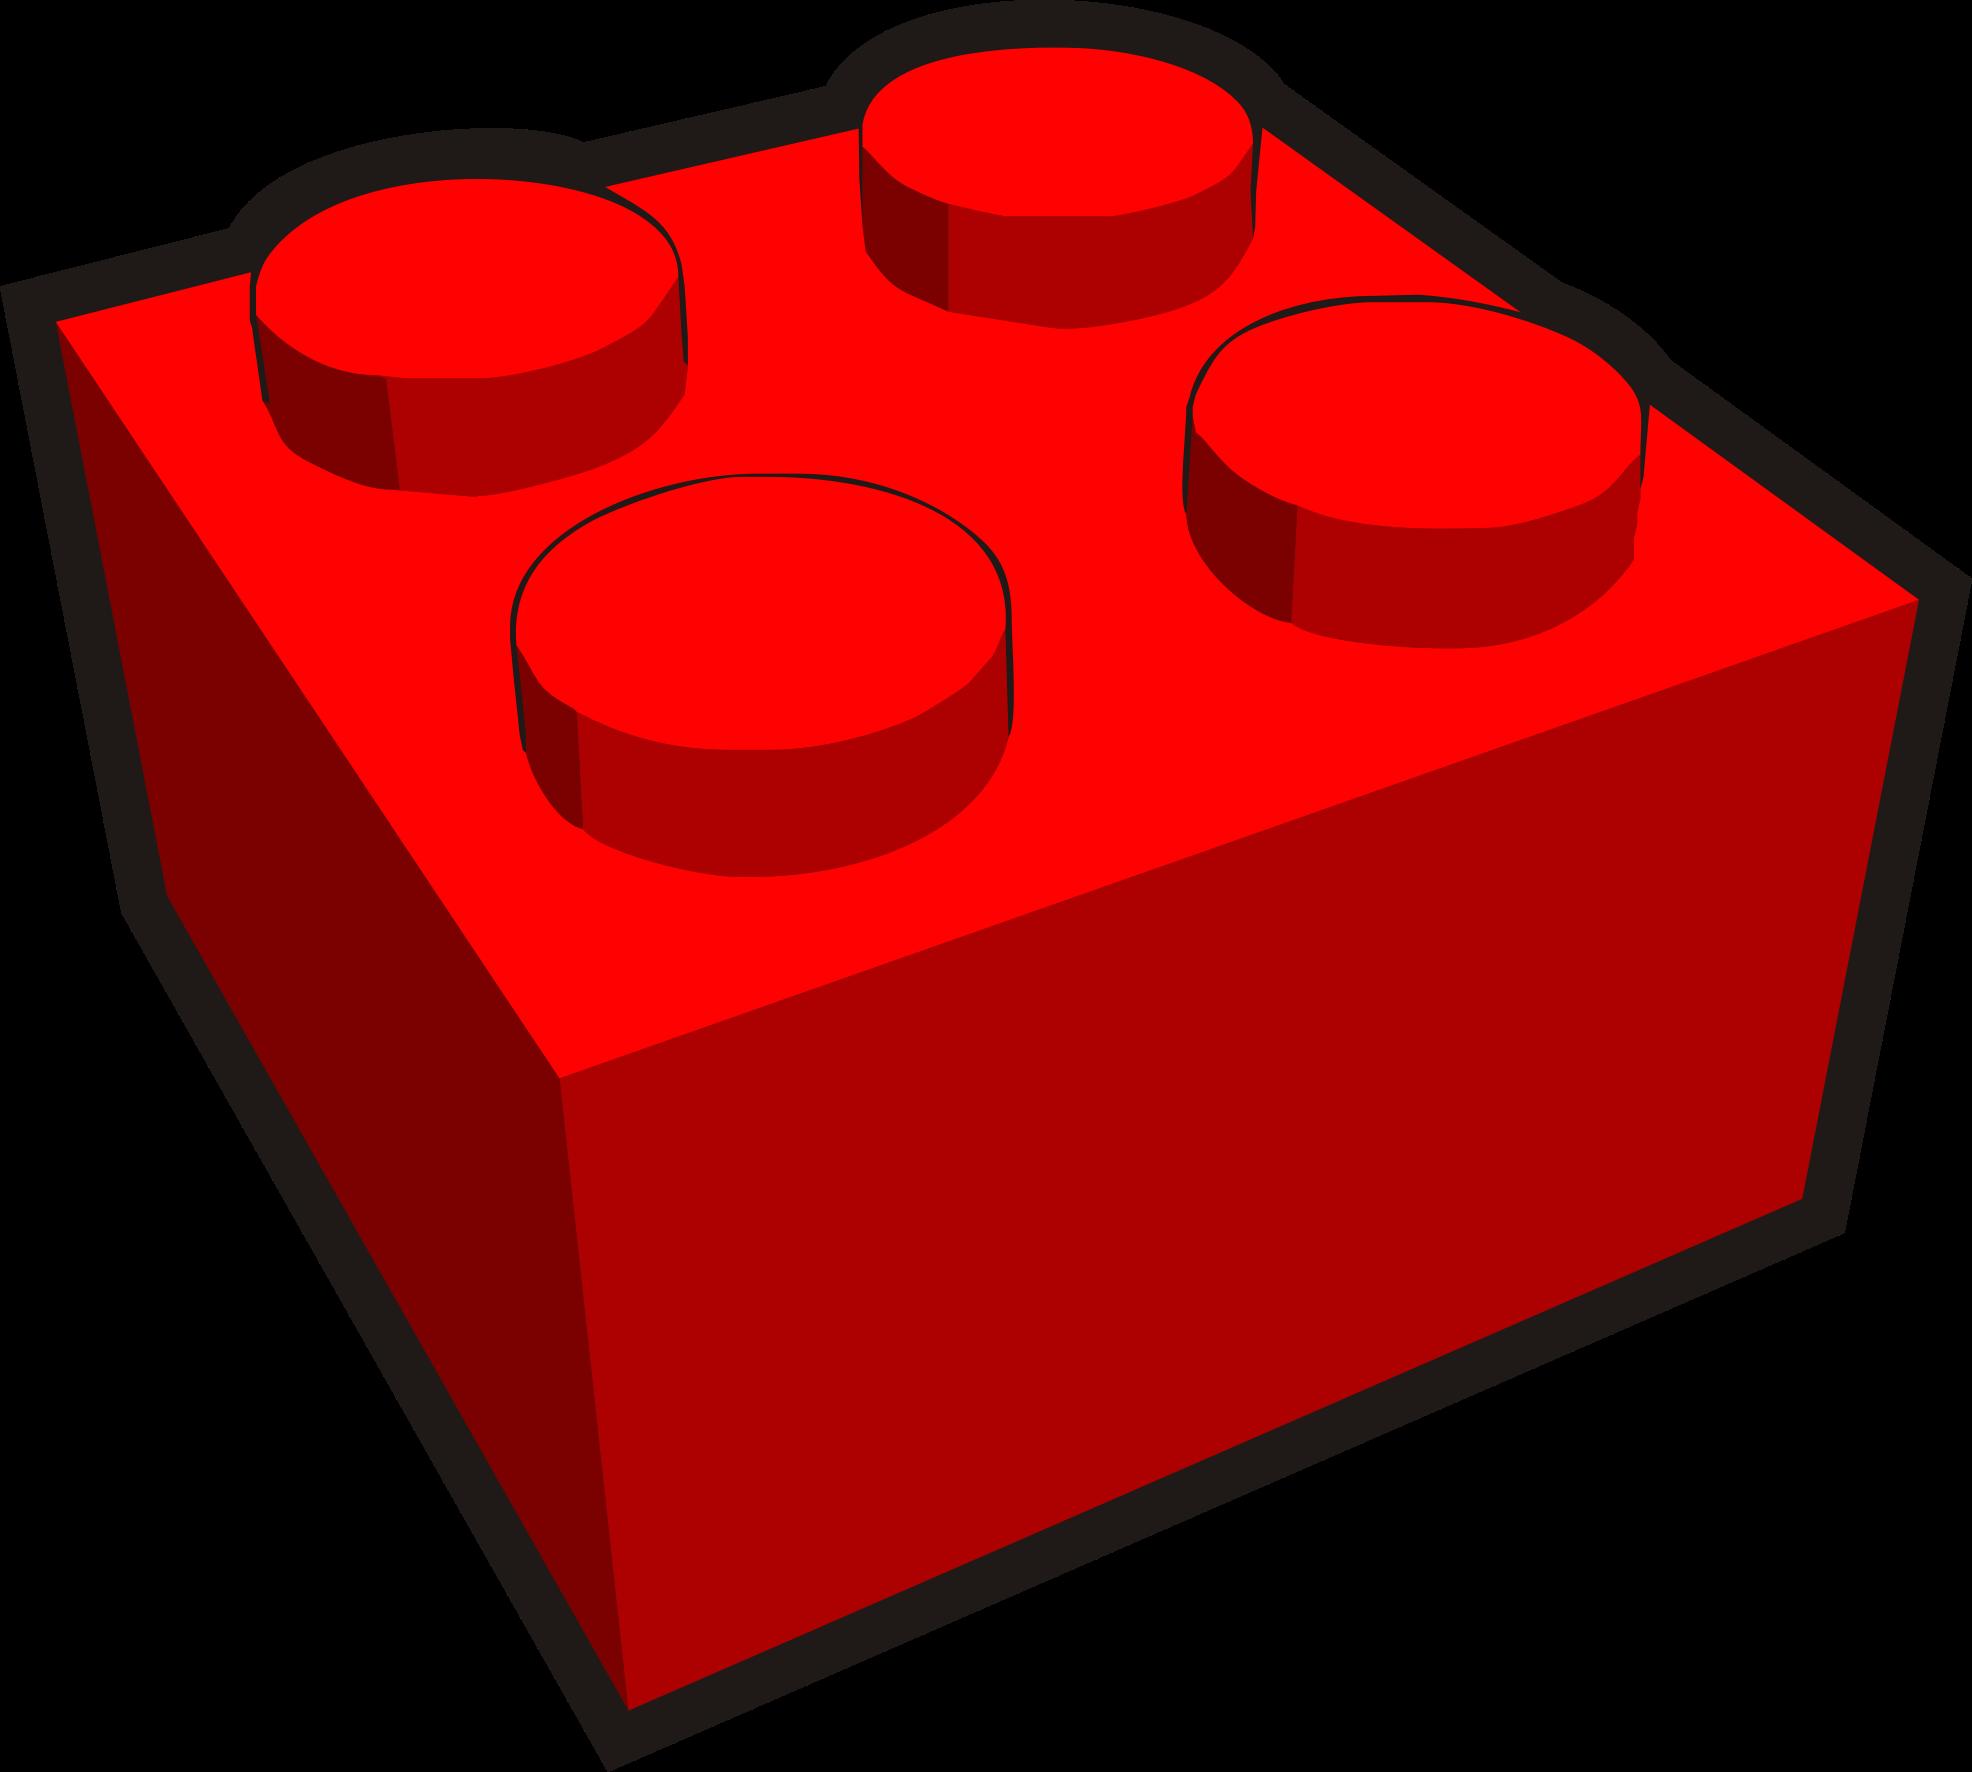 collection of lego. Legos clipart brick